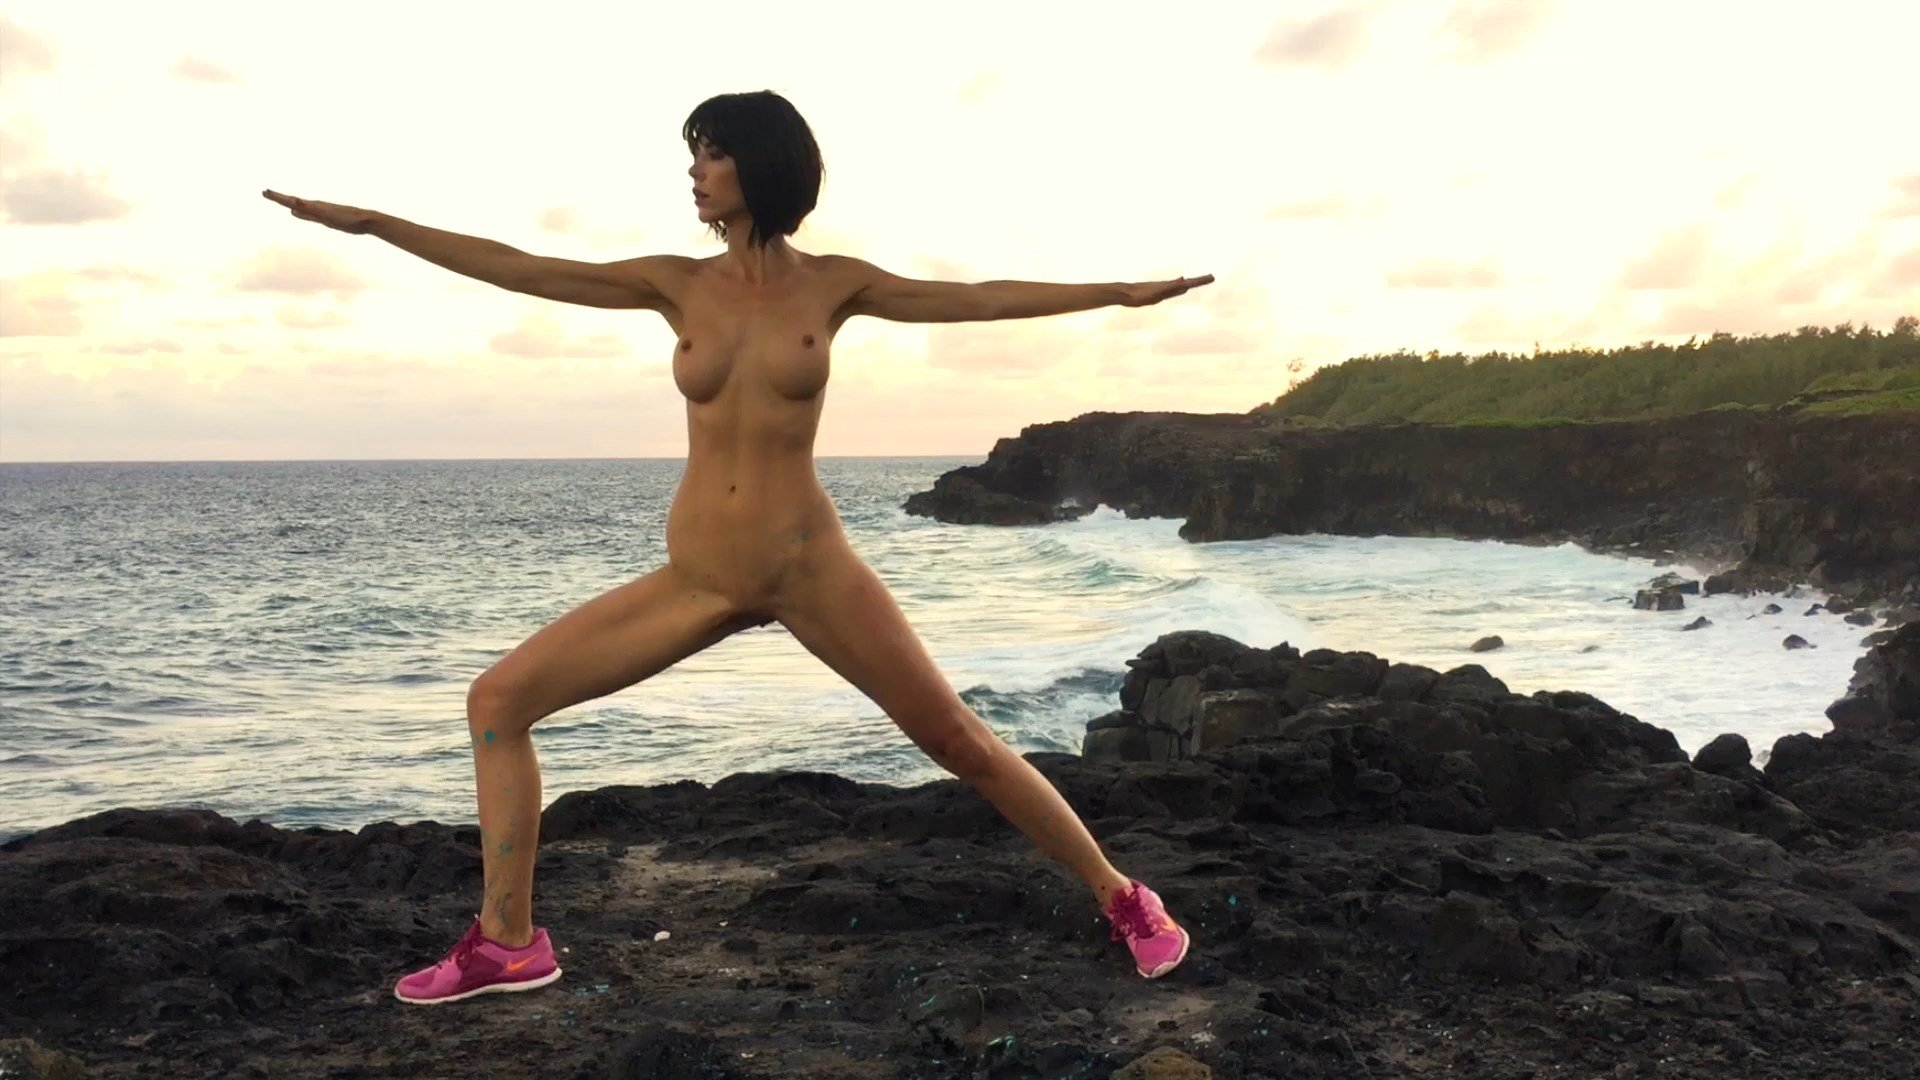 Milo Moiré Naked 40 Photos Videos Thefappening